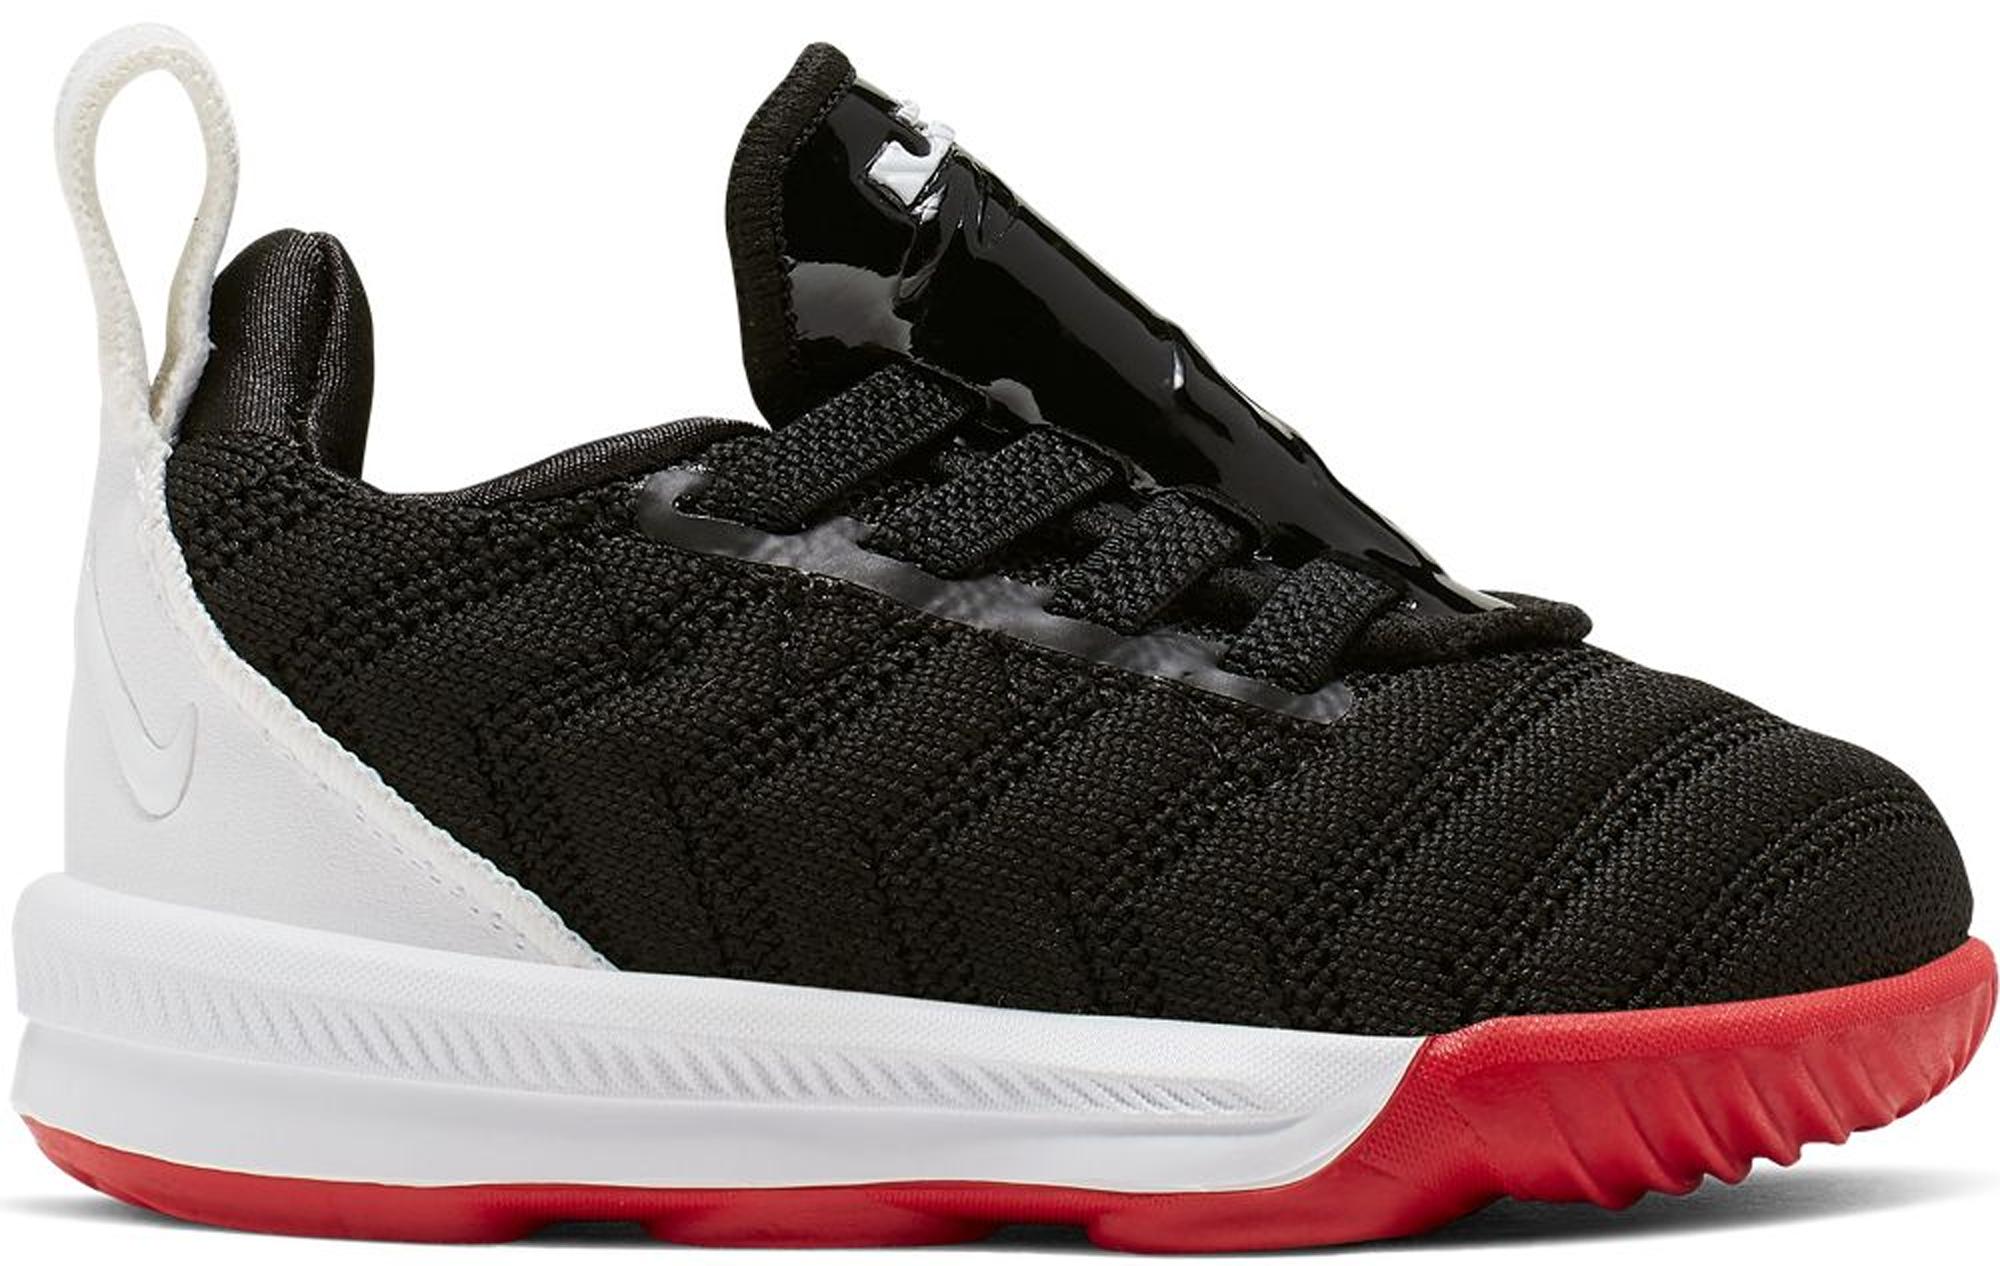 Nike LeBron 16 Red Carpet (TD) - AQ2468-016